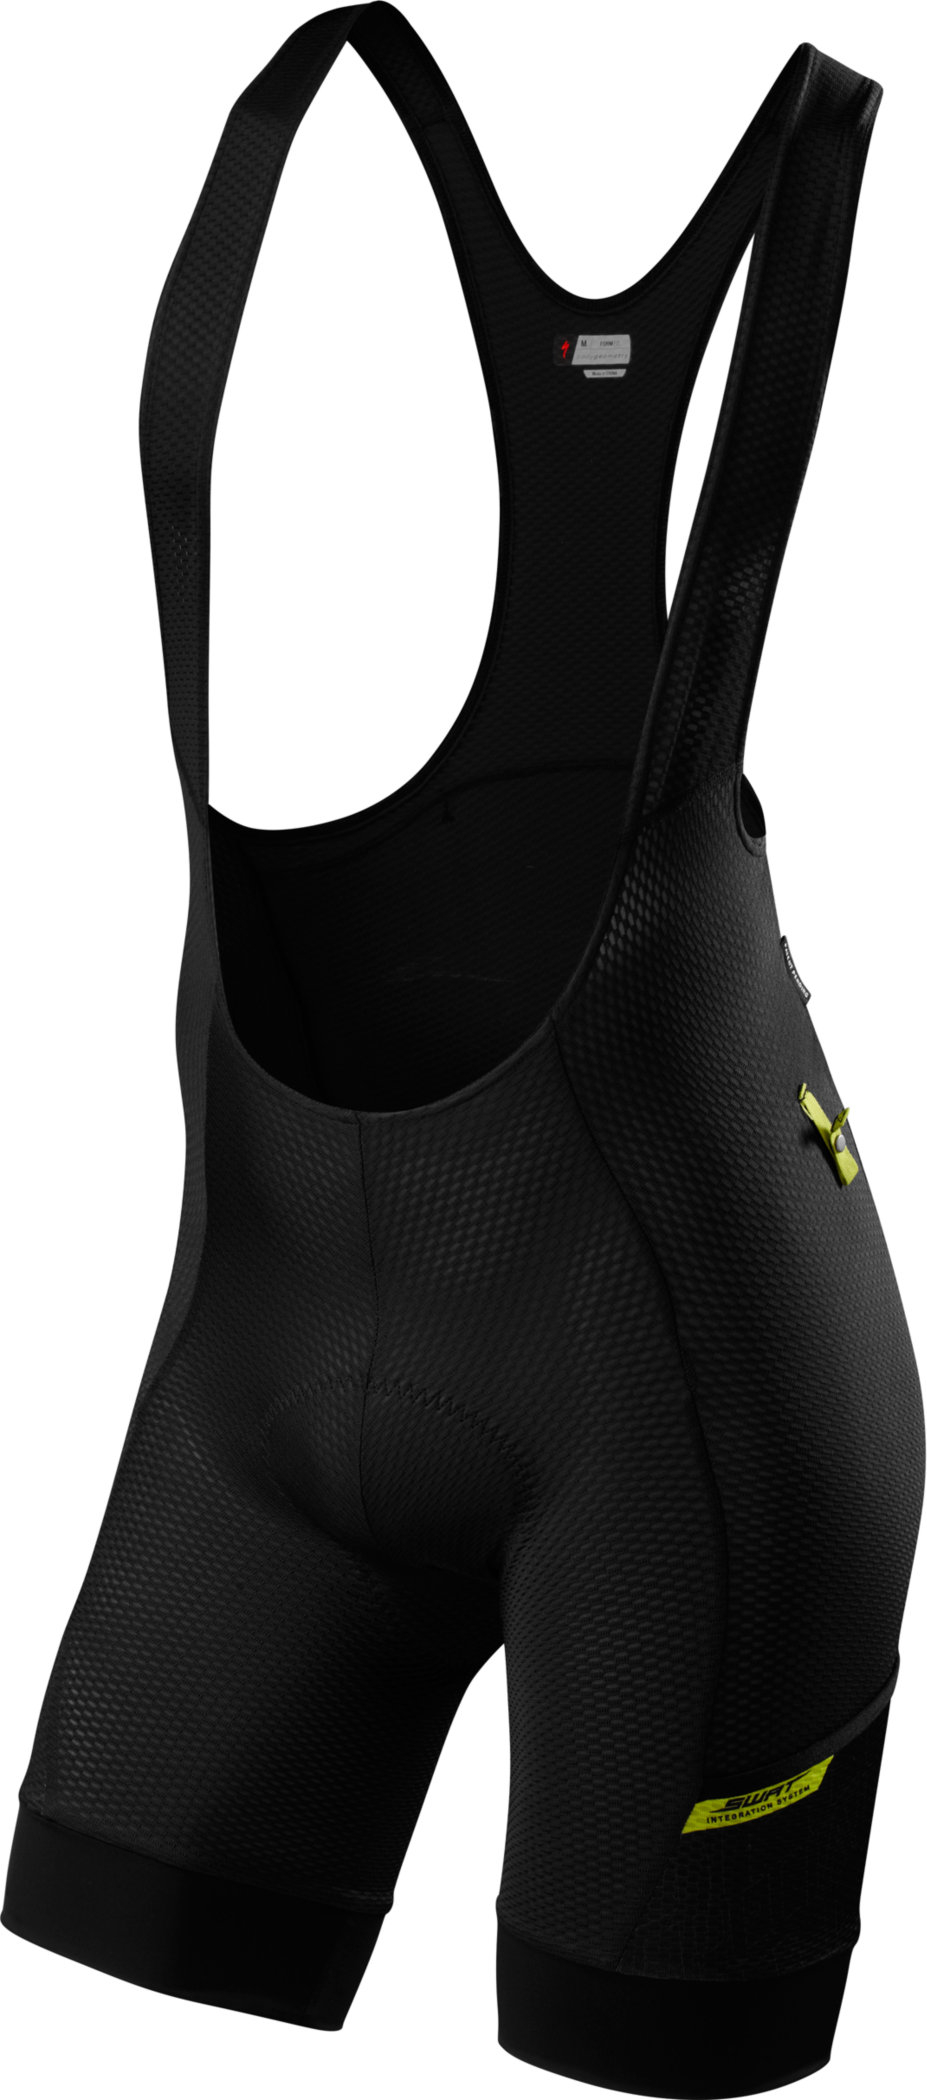 2016 Specialized 2015 Mountain Bib Liner Short Concept Swat Store Black Hyper Green